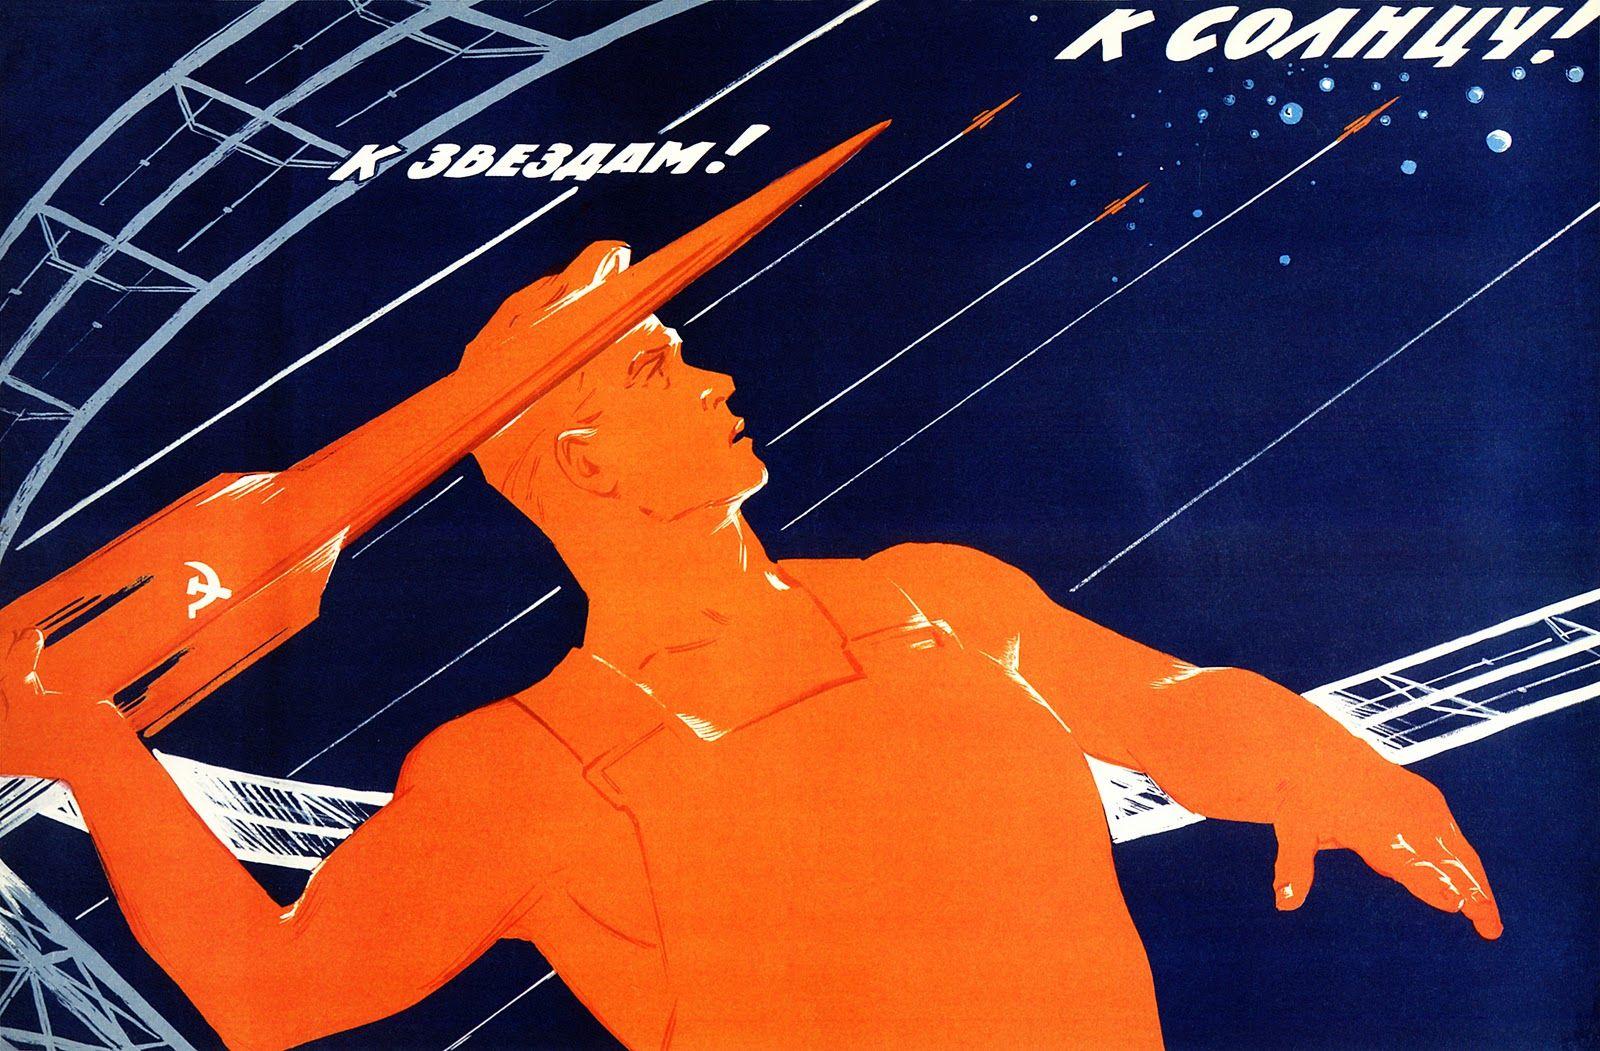 Program Russian 32